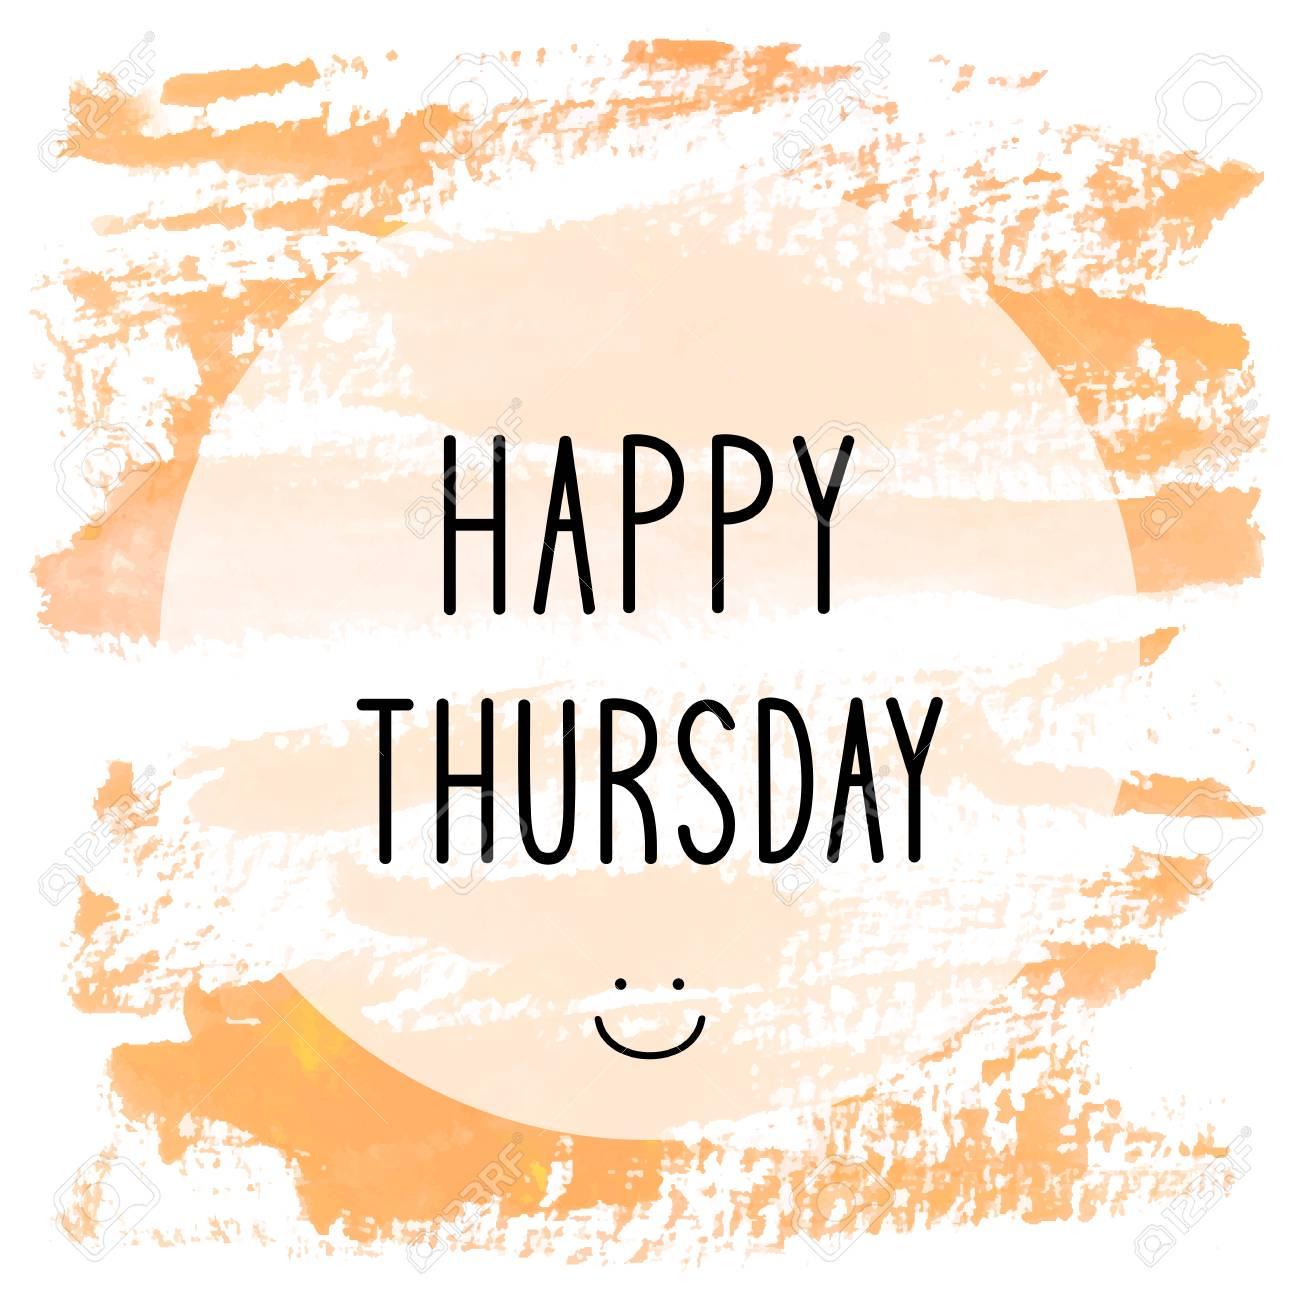 Happy Thursday Text On Orange Watercolor Background Stock Photo